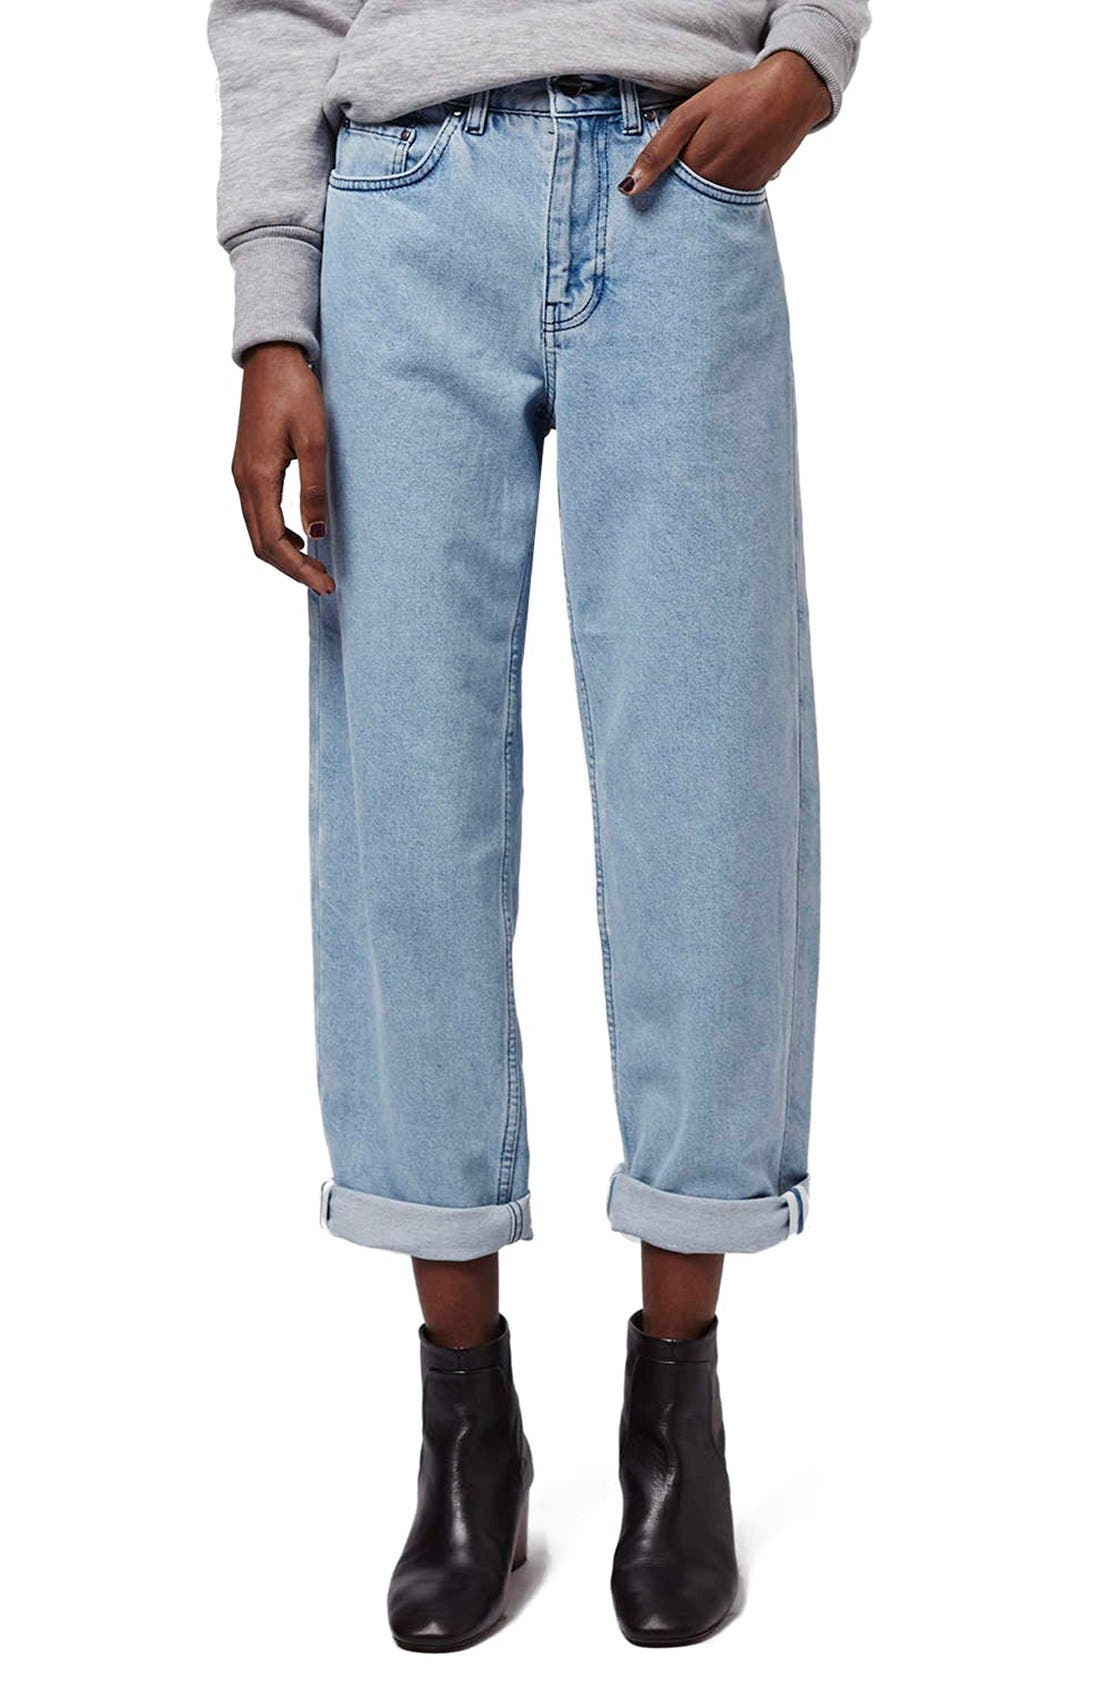 Alternate Image 1 Selected - Topshop Boutique Wide Leg Jeans